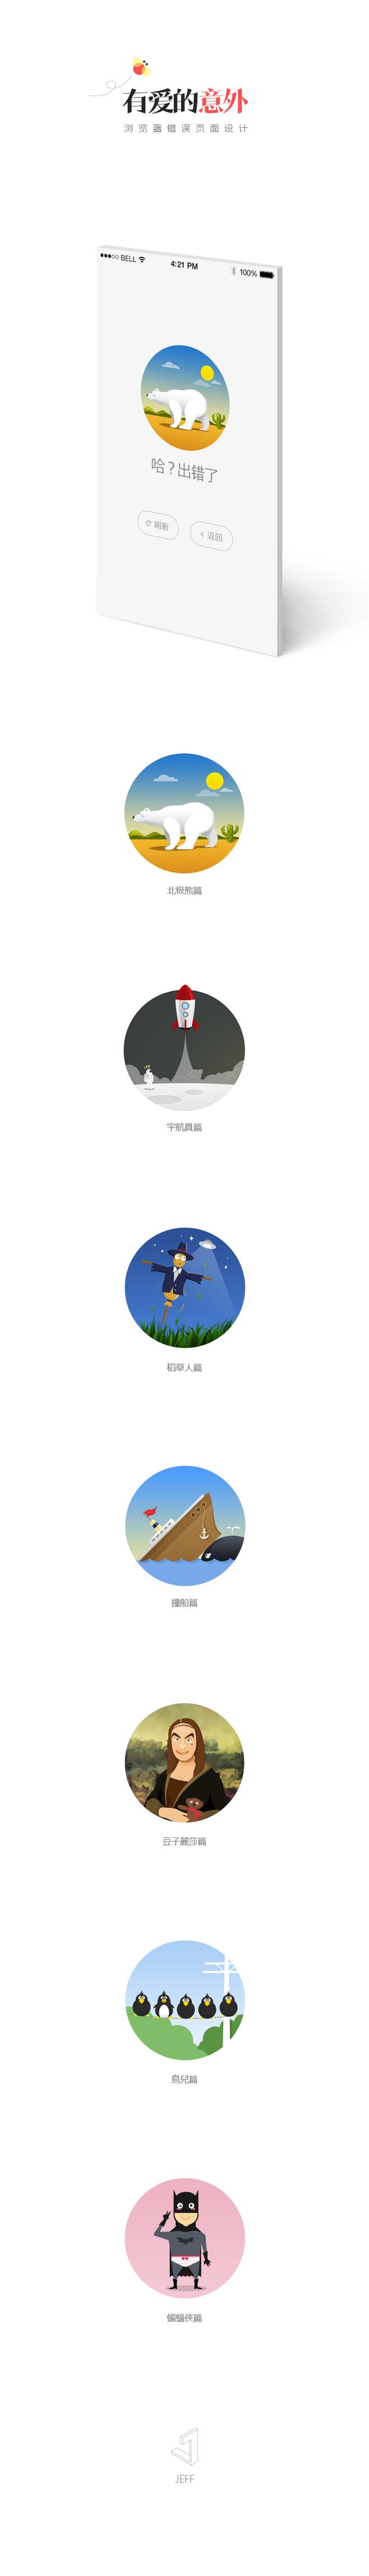 app空状态设计